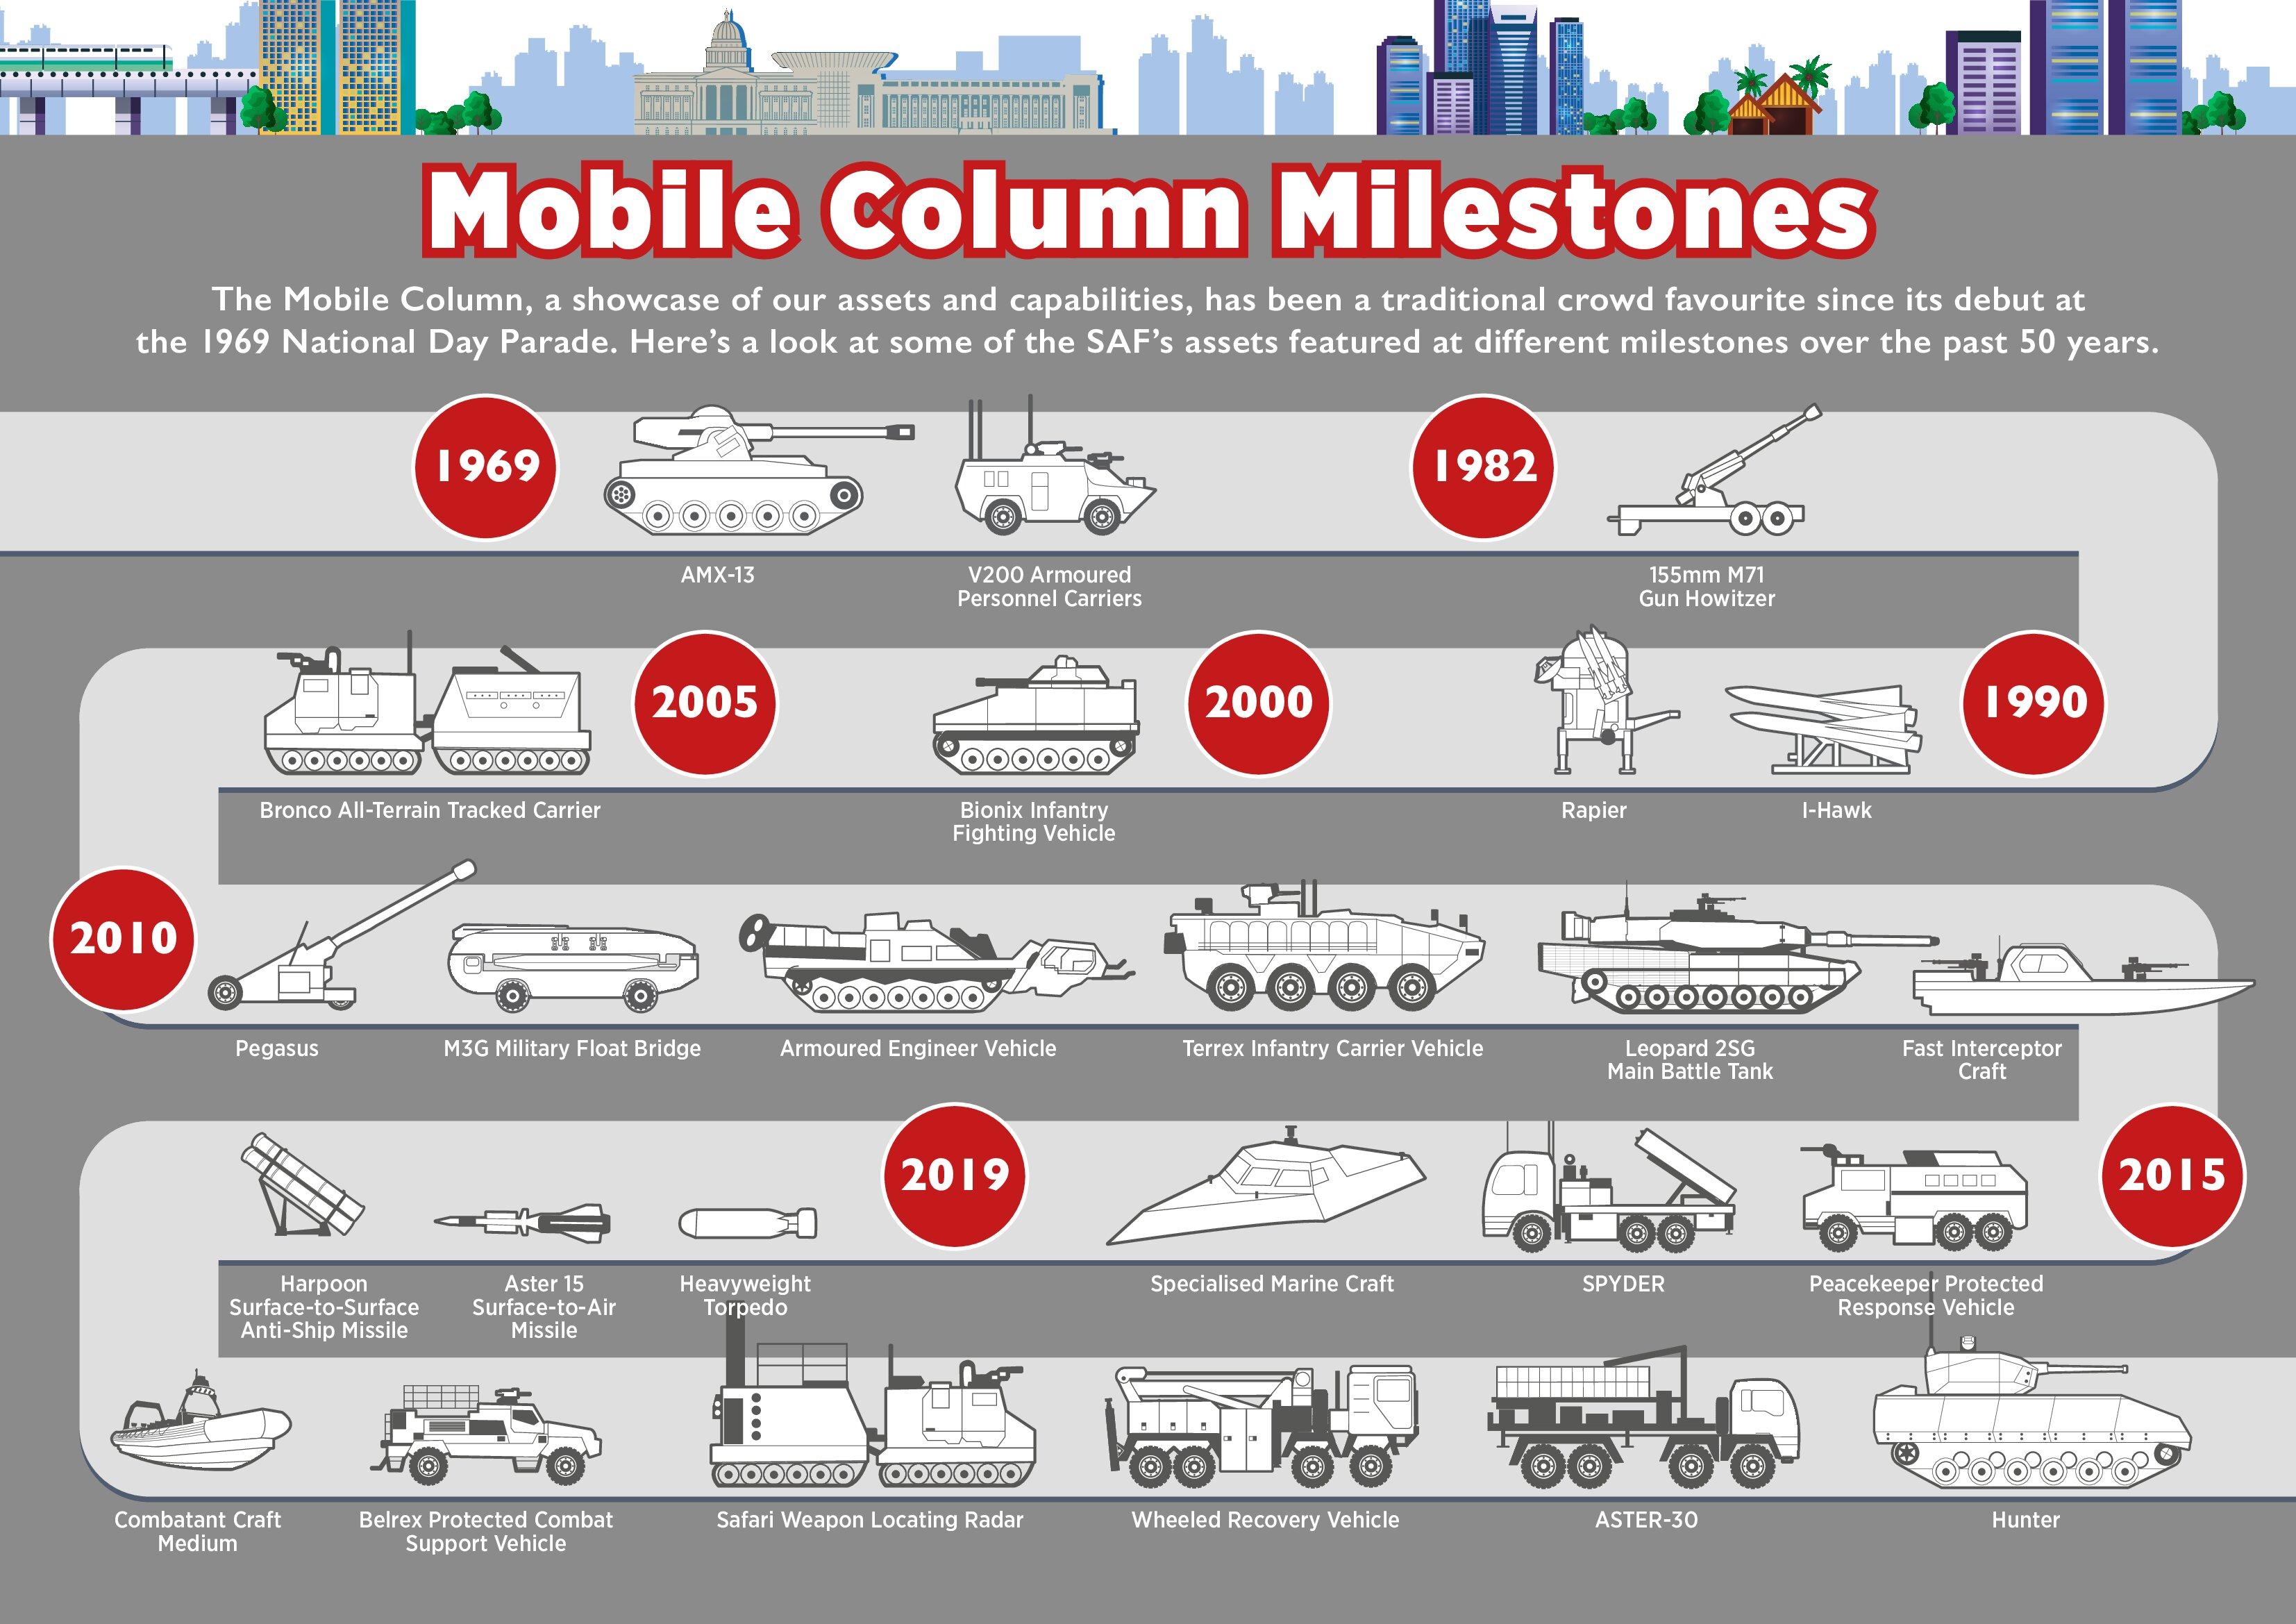 20190808 Infographic - Mobile Column Milestones.jpg